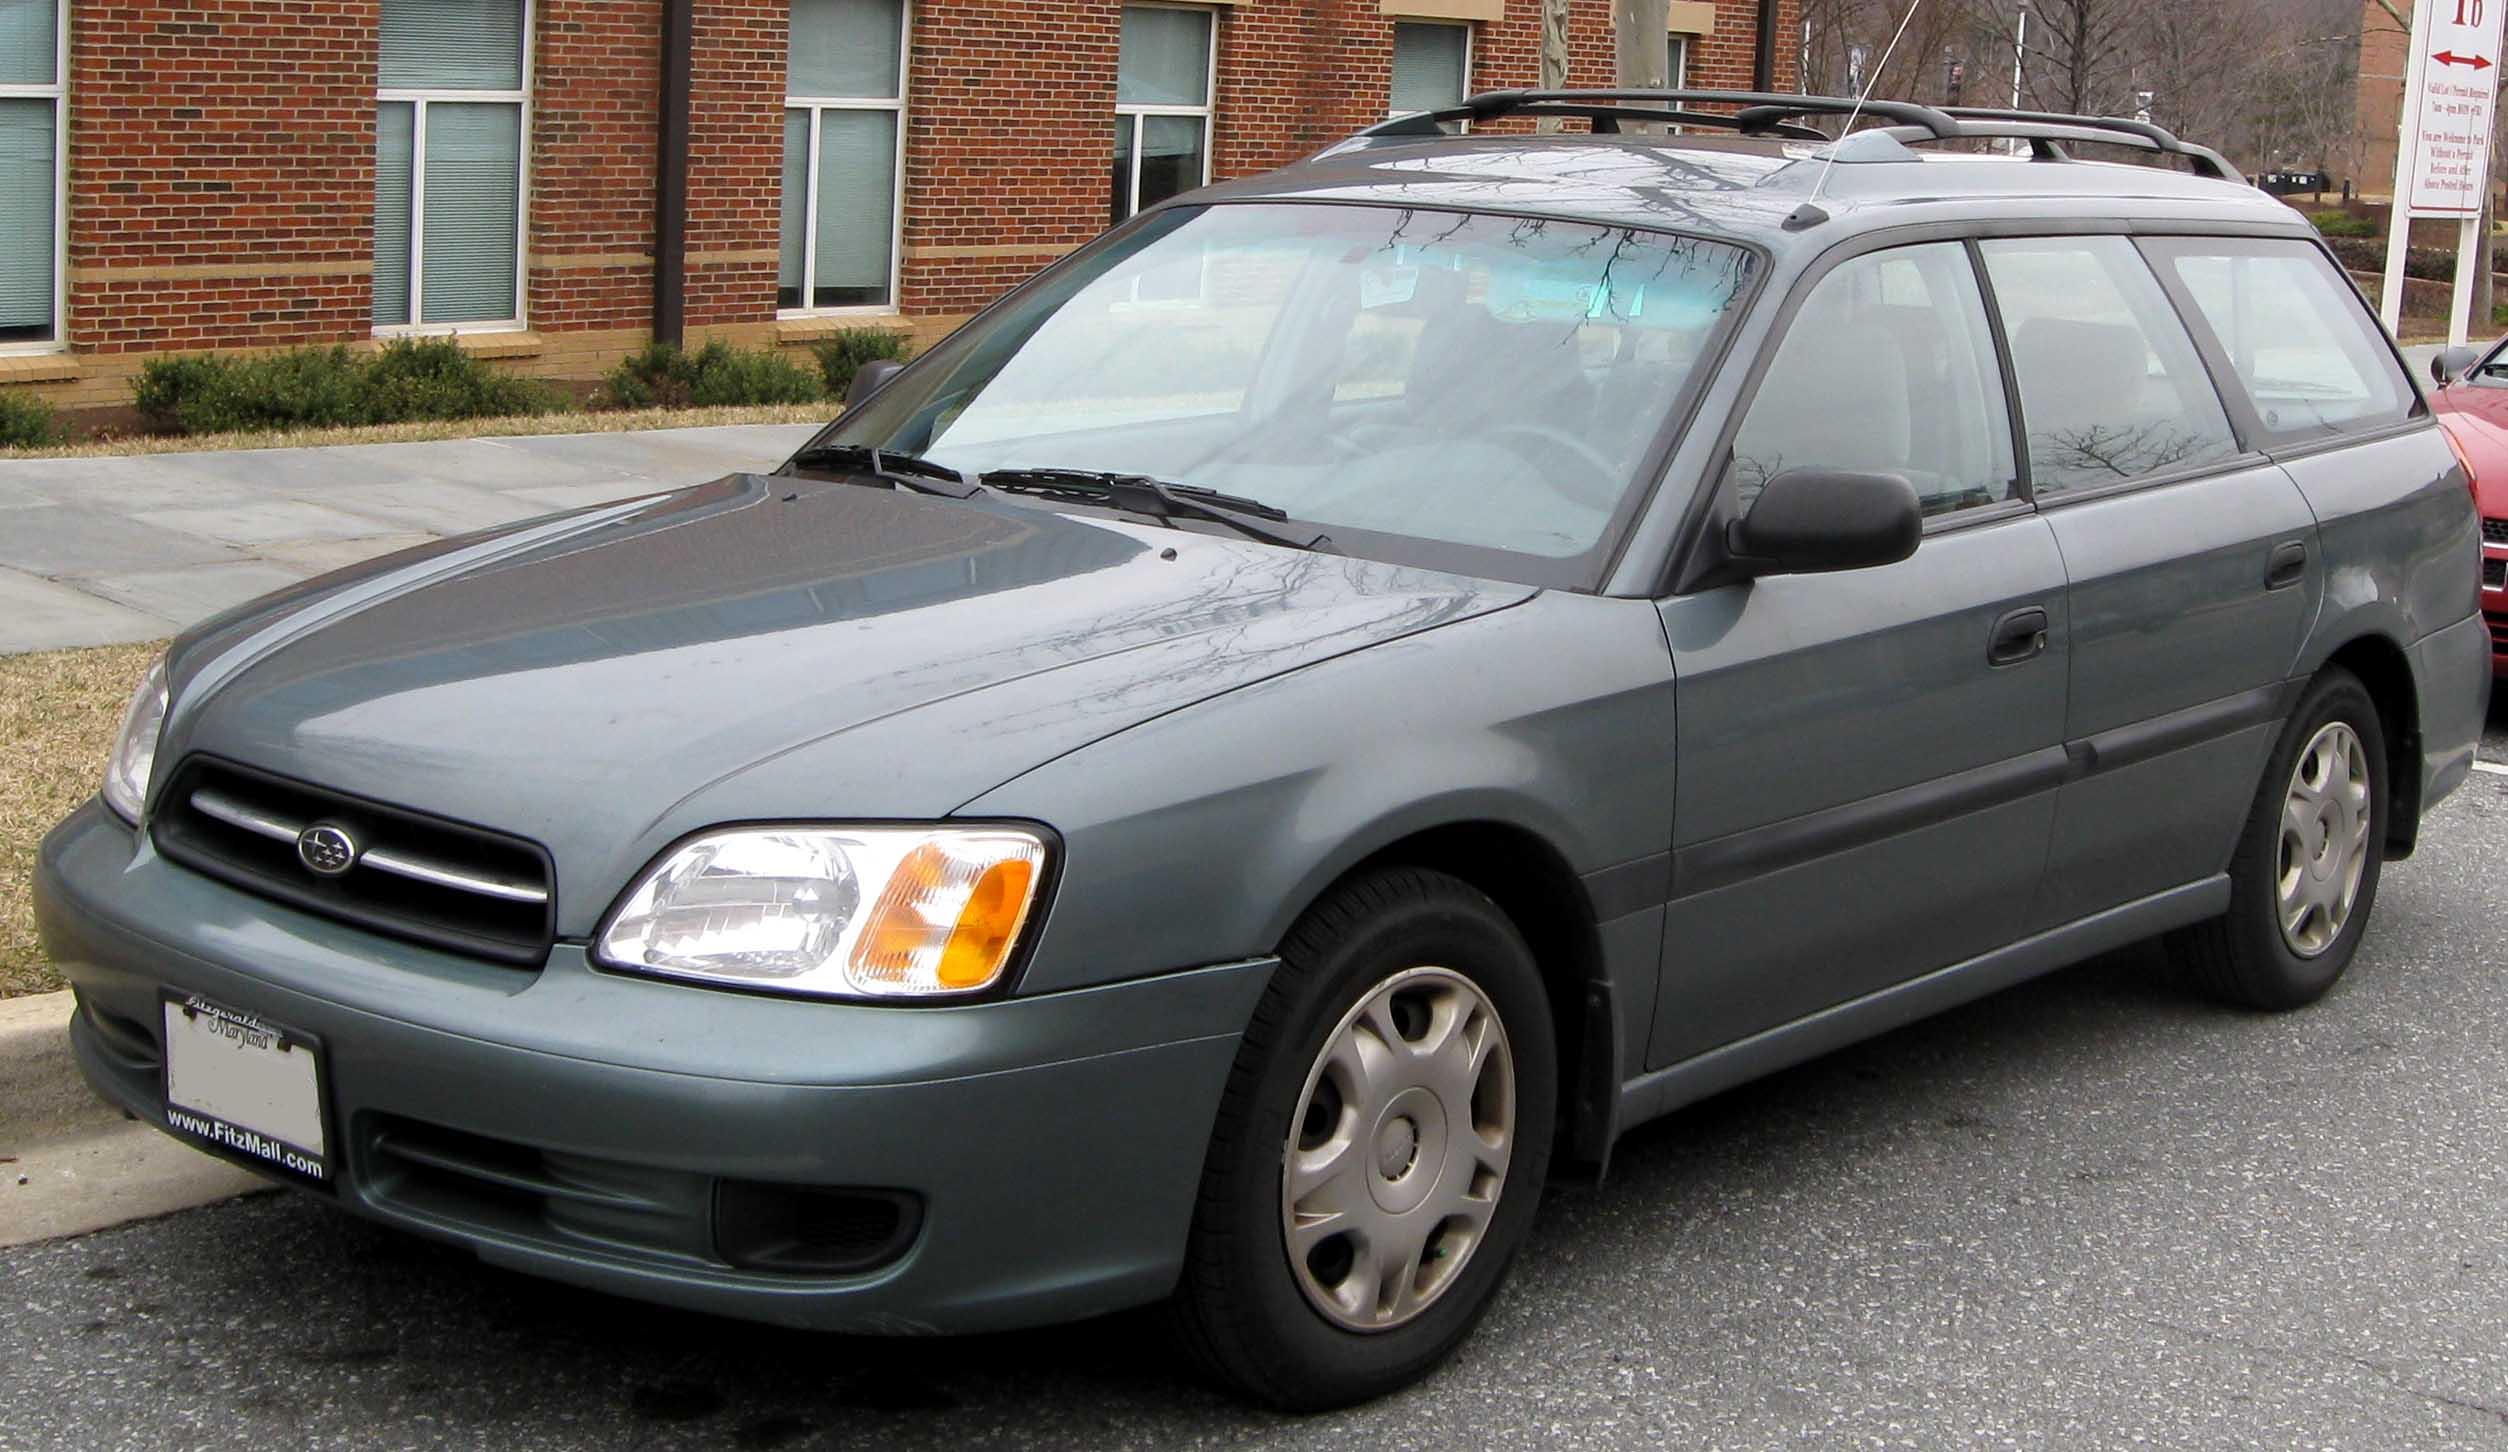 2000 Subaru Legacy (3rd gen)